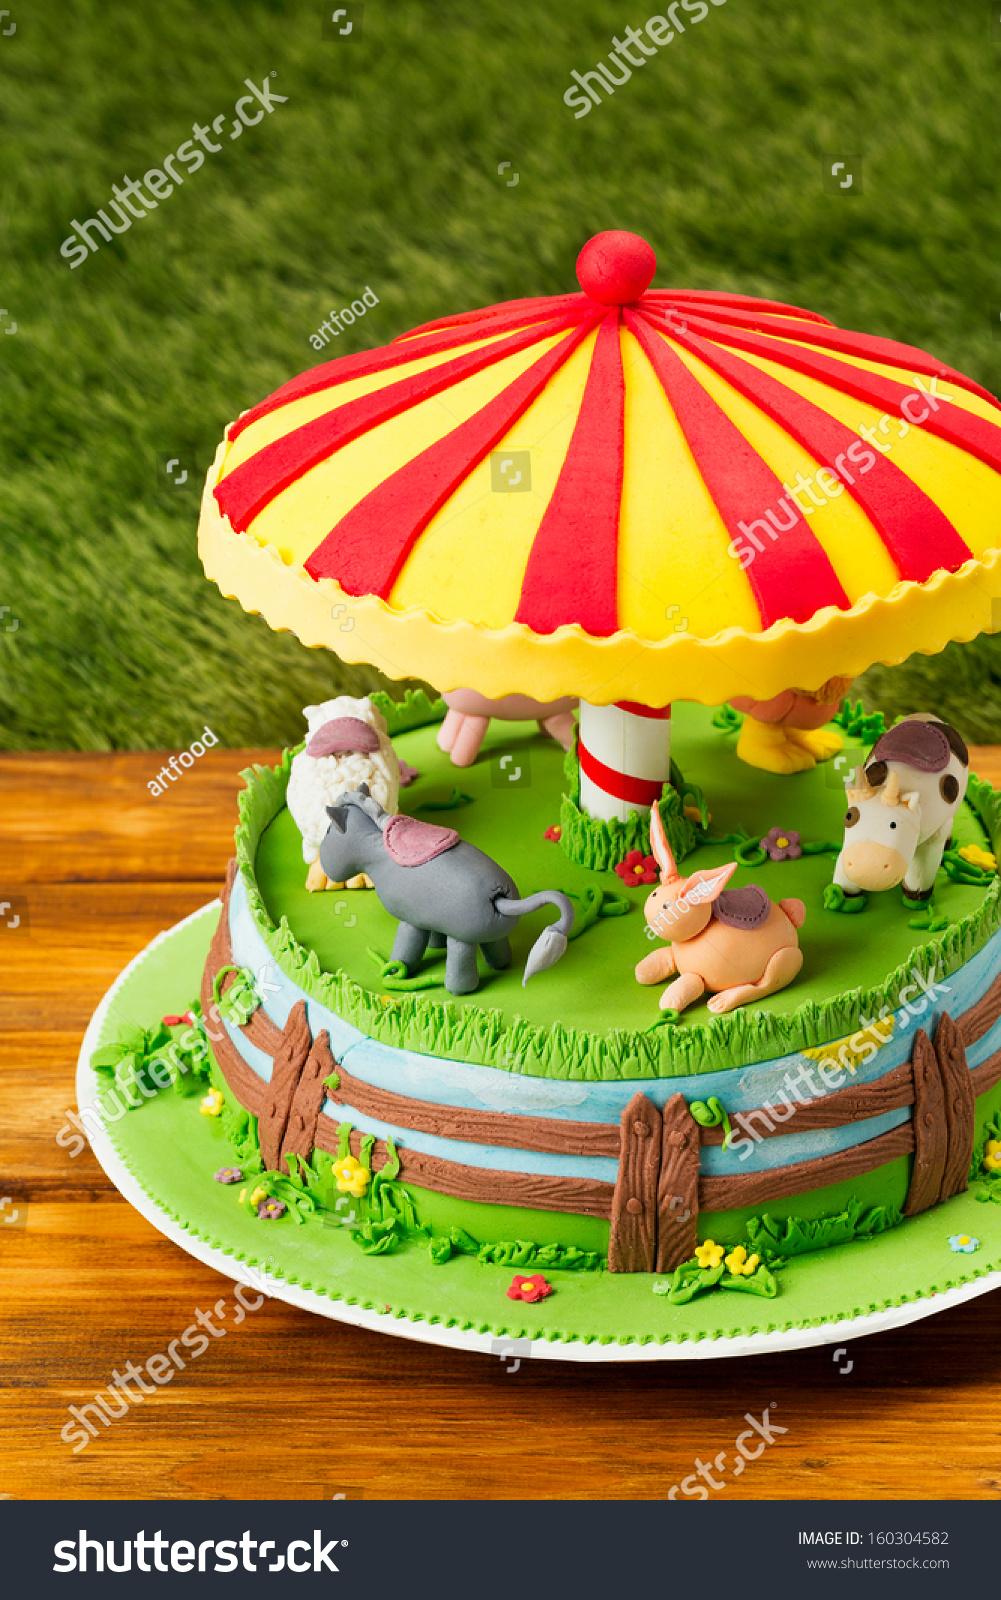 fondant cakefarm themed cake children cake stock photo